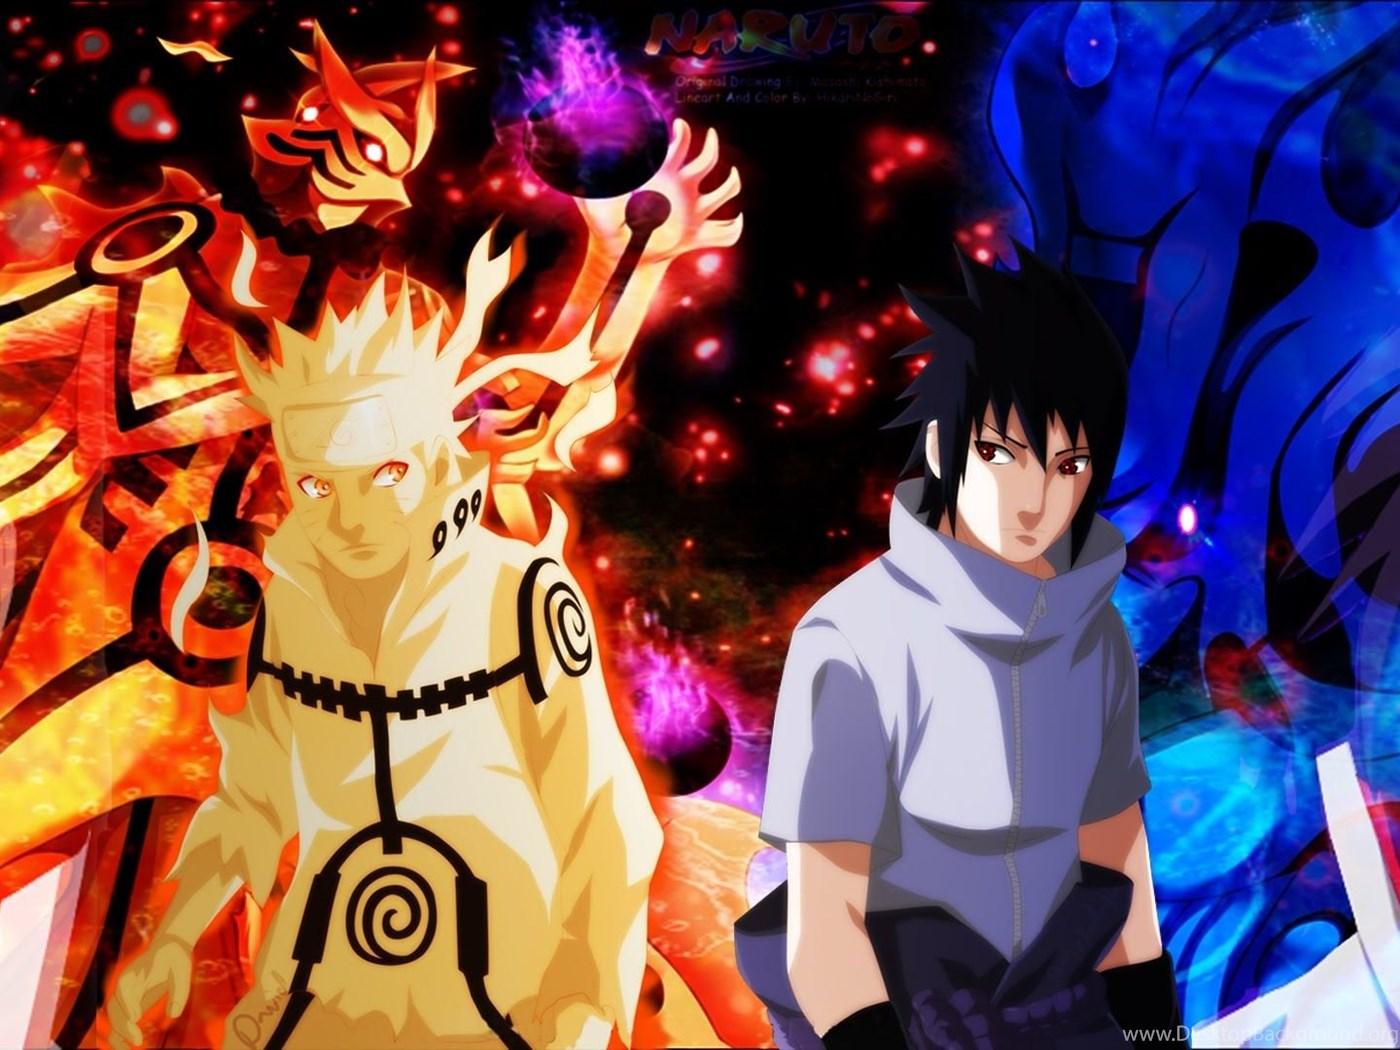 Naruto Vs Sasuke Dual Monitor Wallpaper Freewallanime